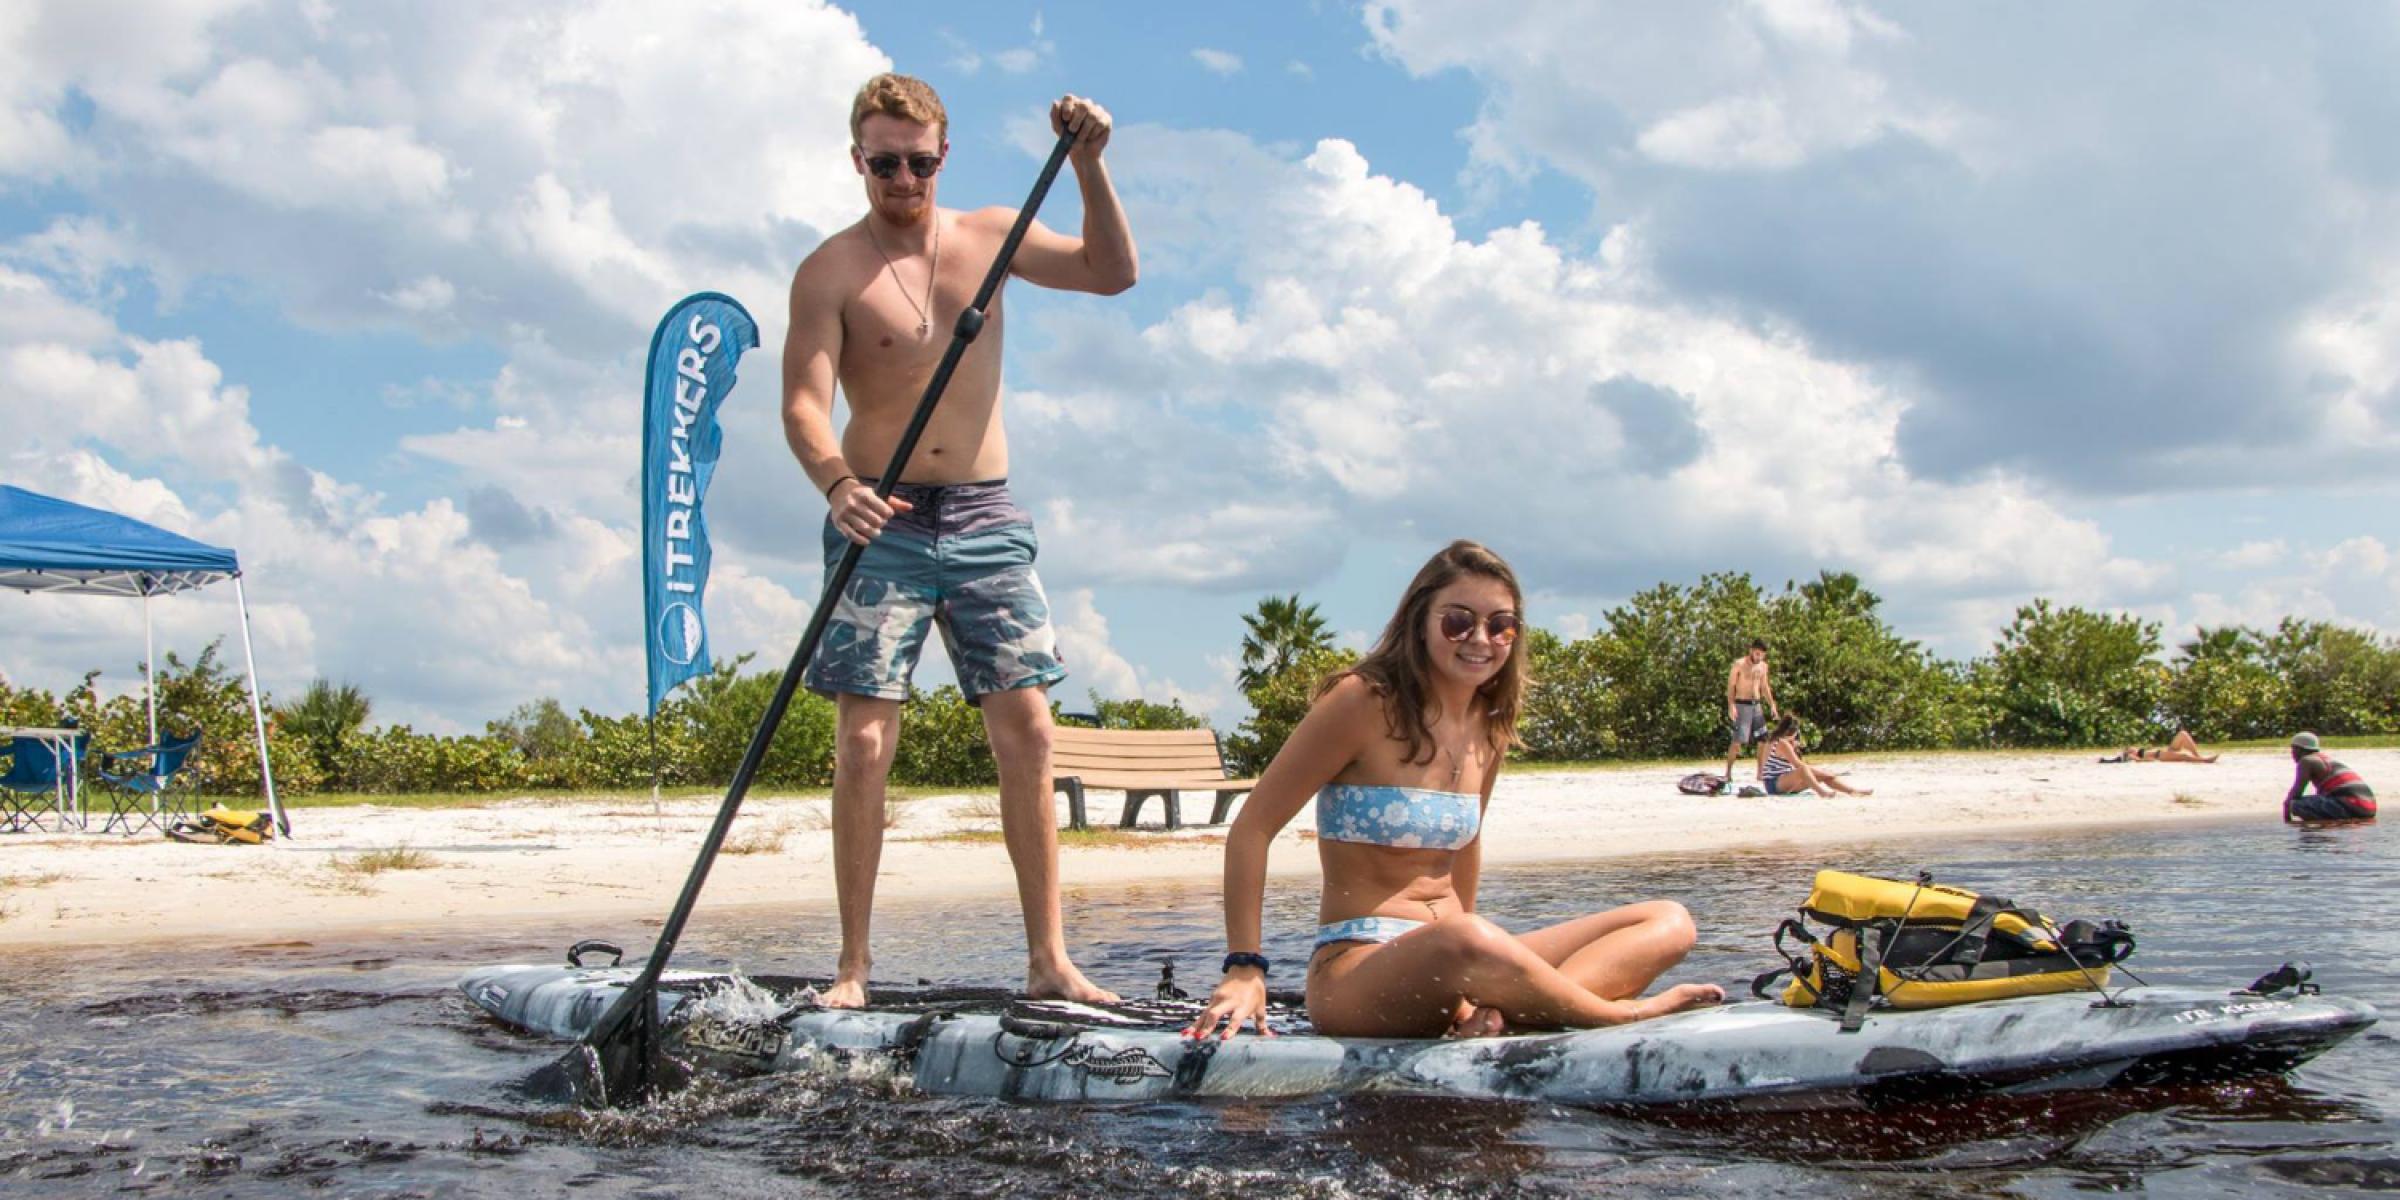 Easy machine meet the friendly aquatic life in wacky waters slots update